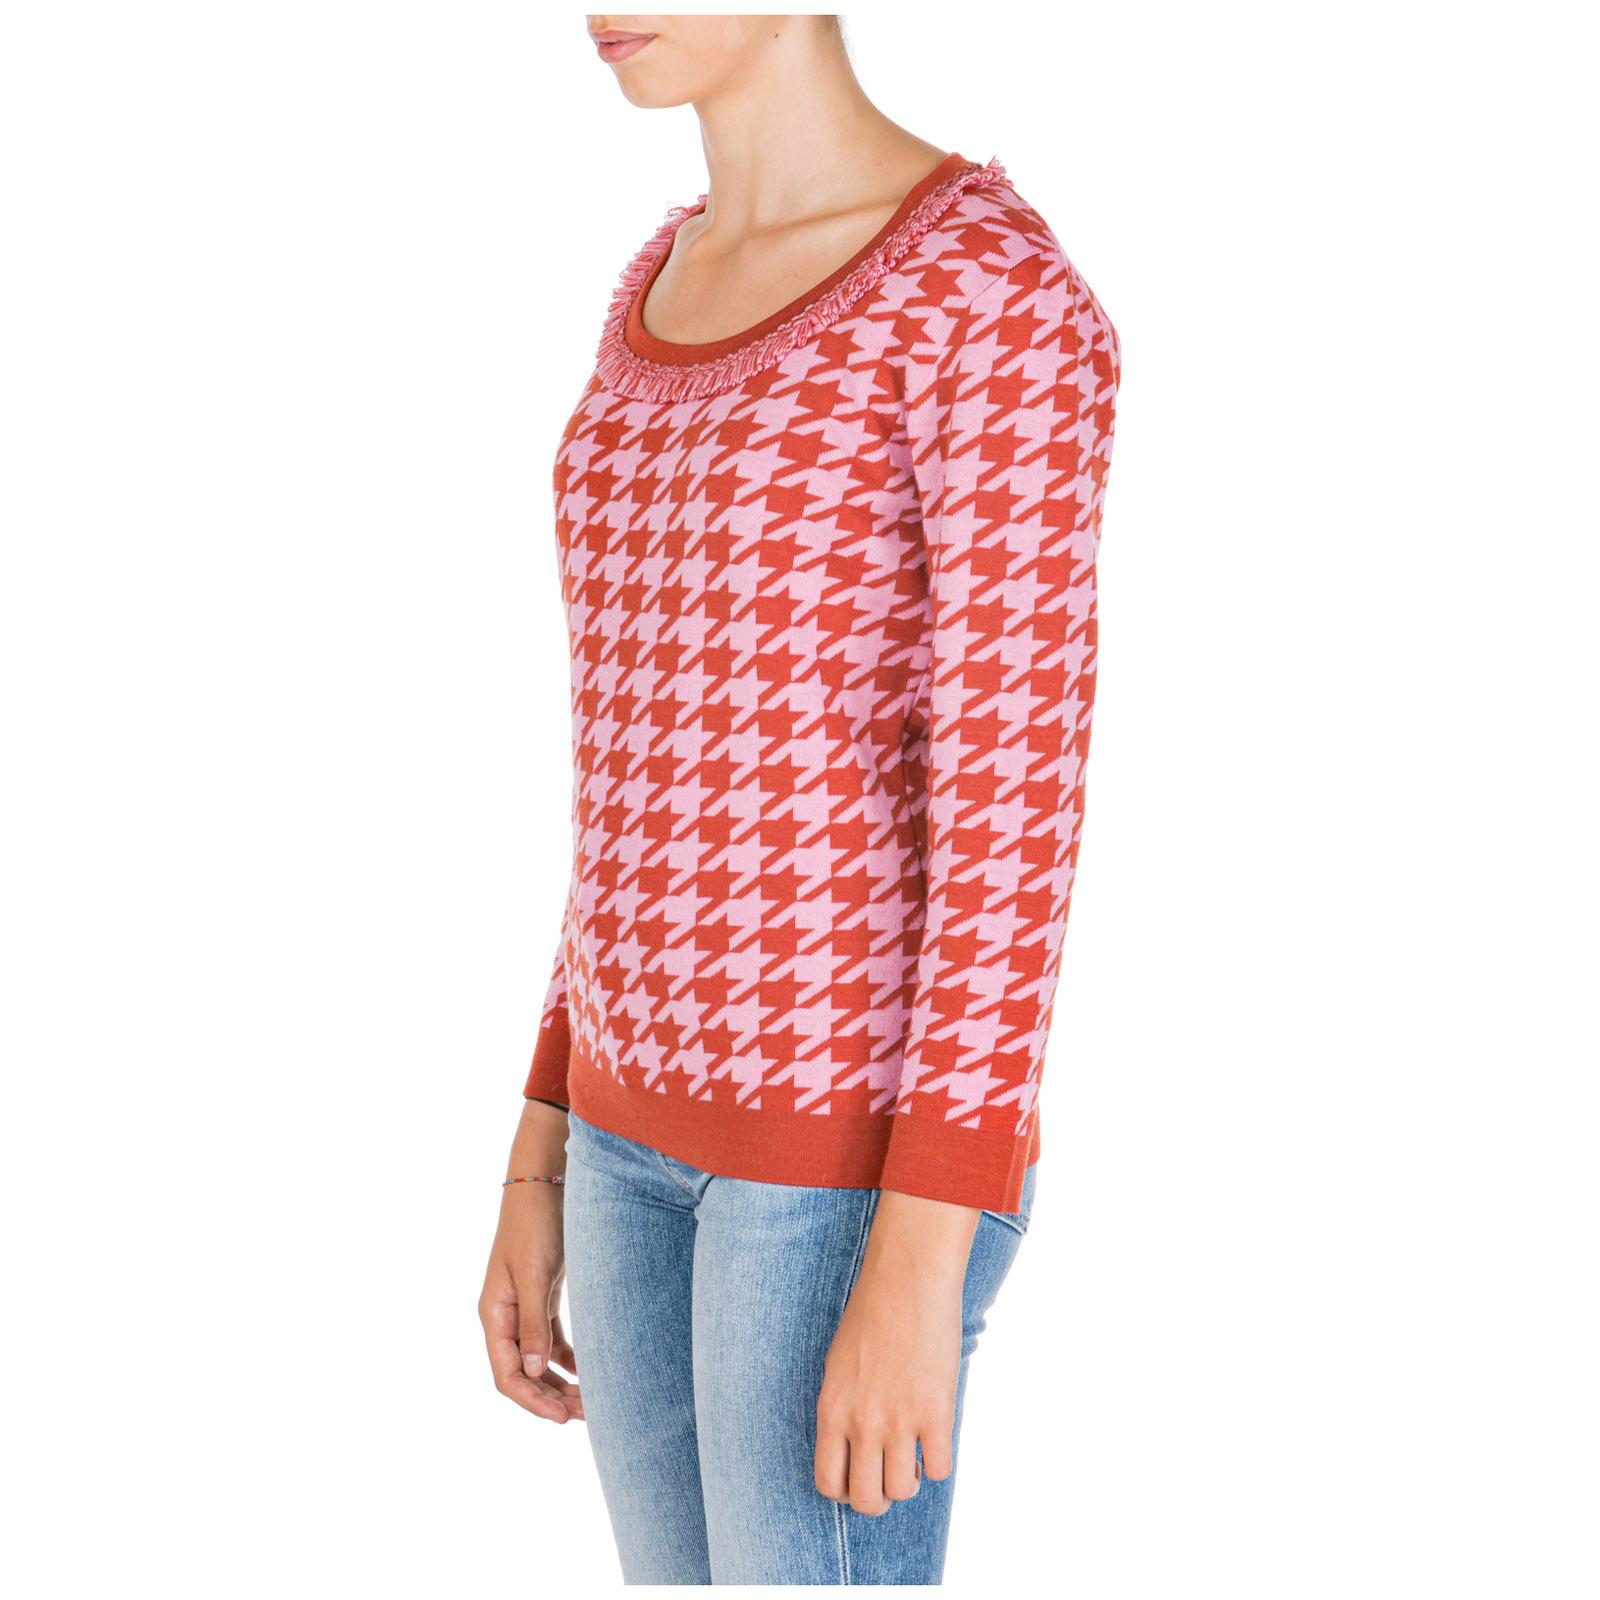 quality design 21084 90480 Damen pullover pulli